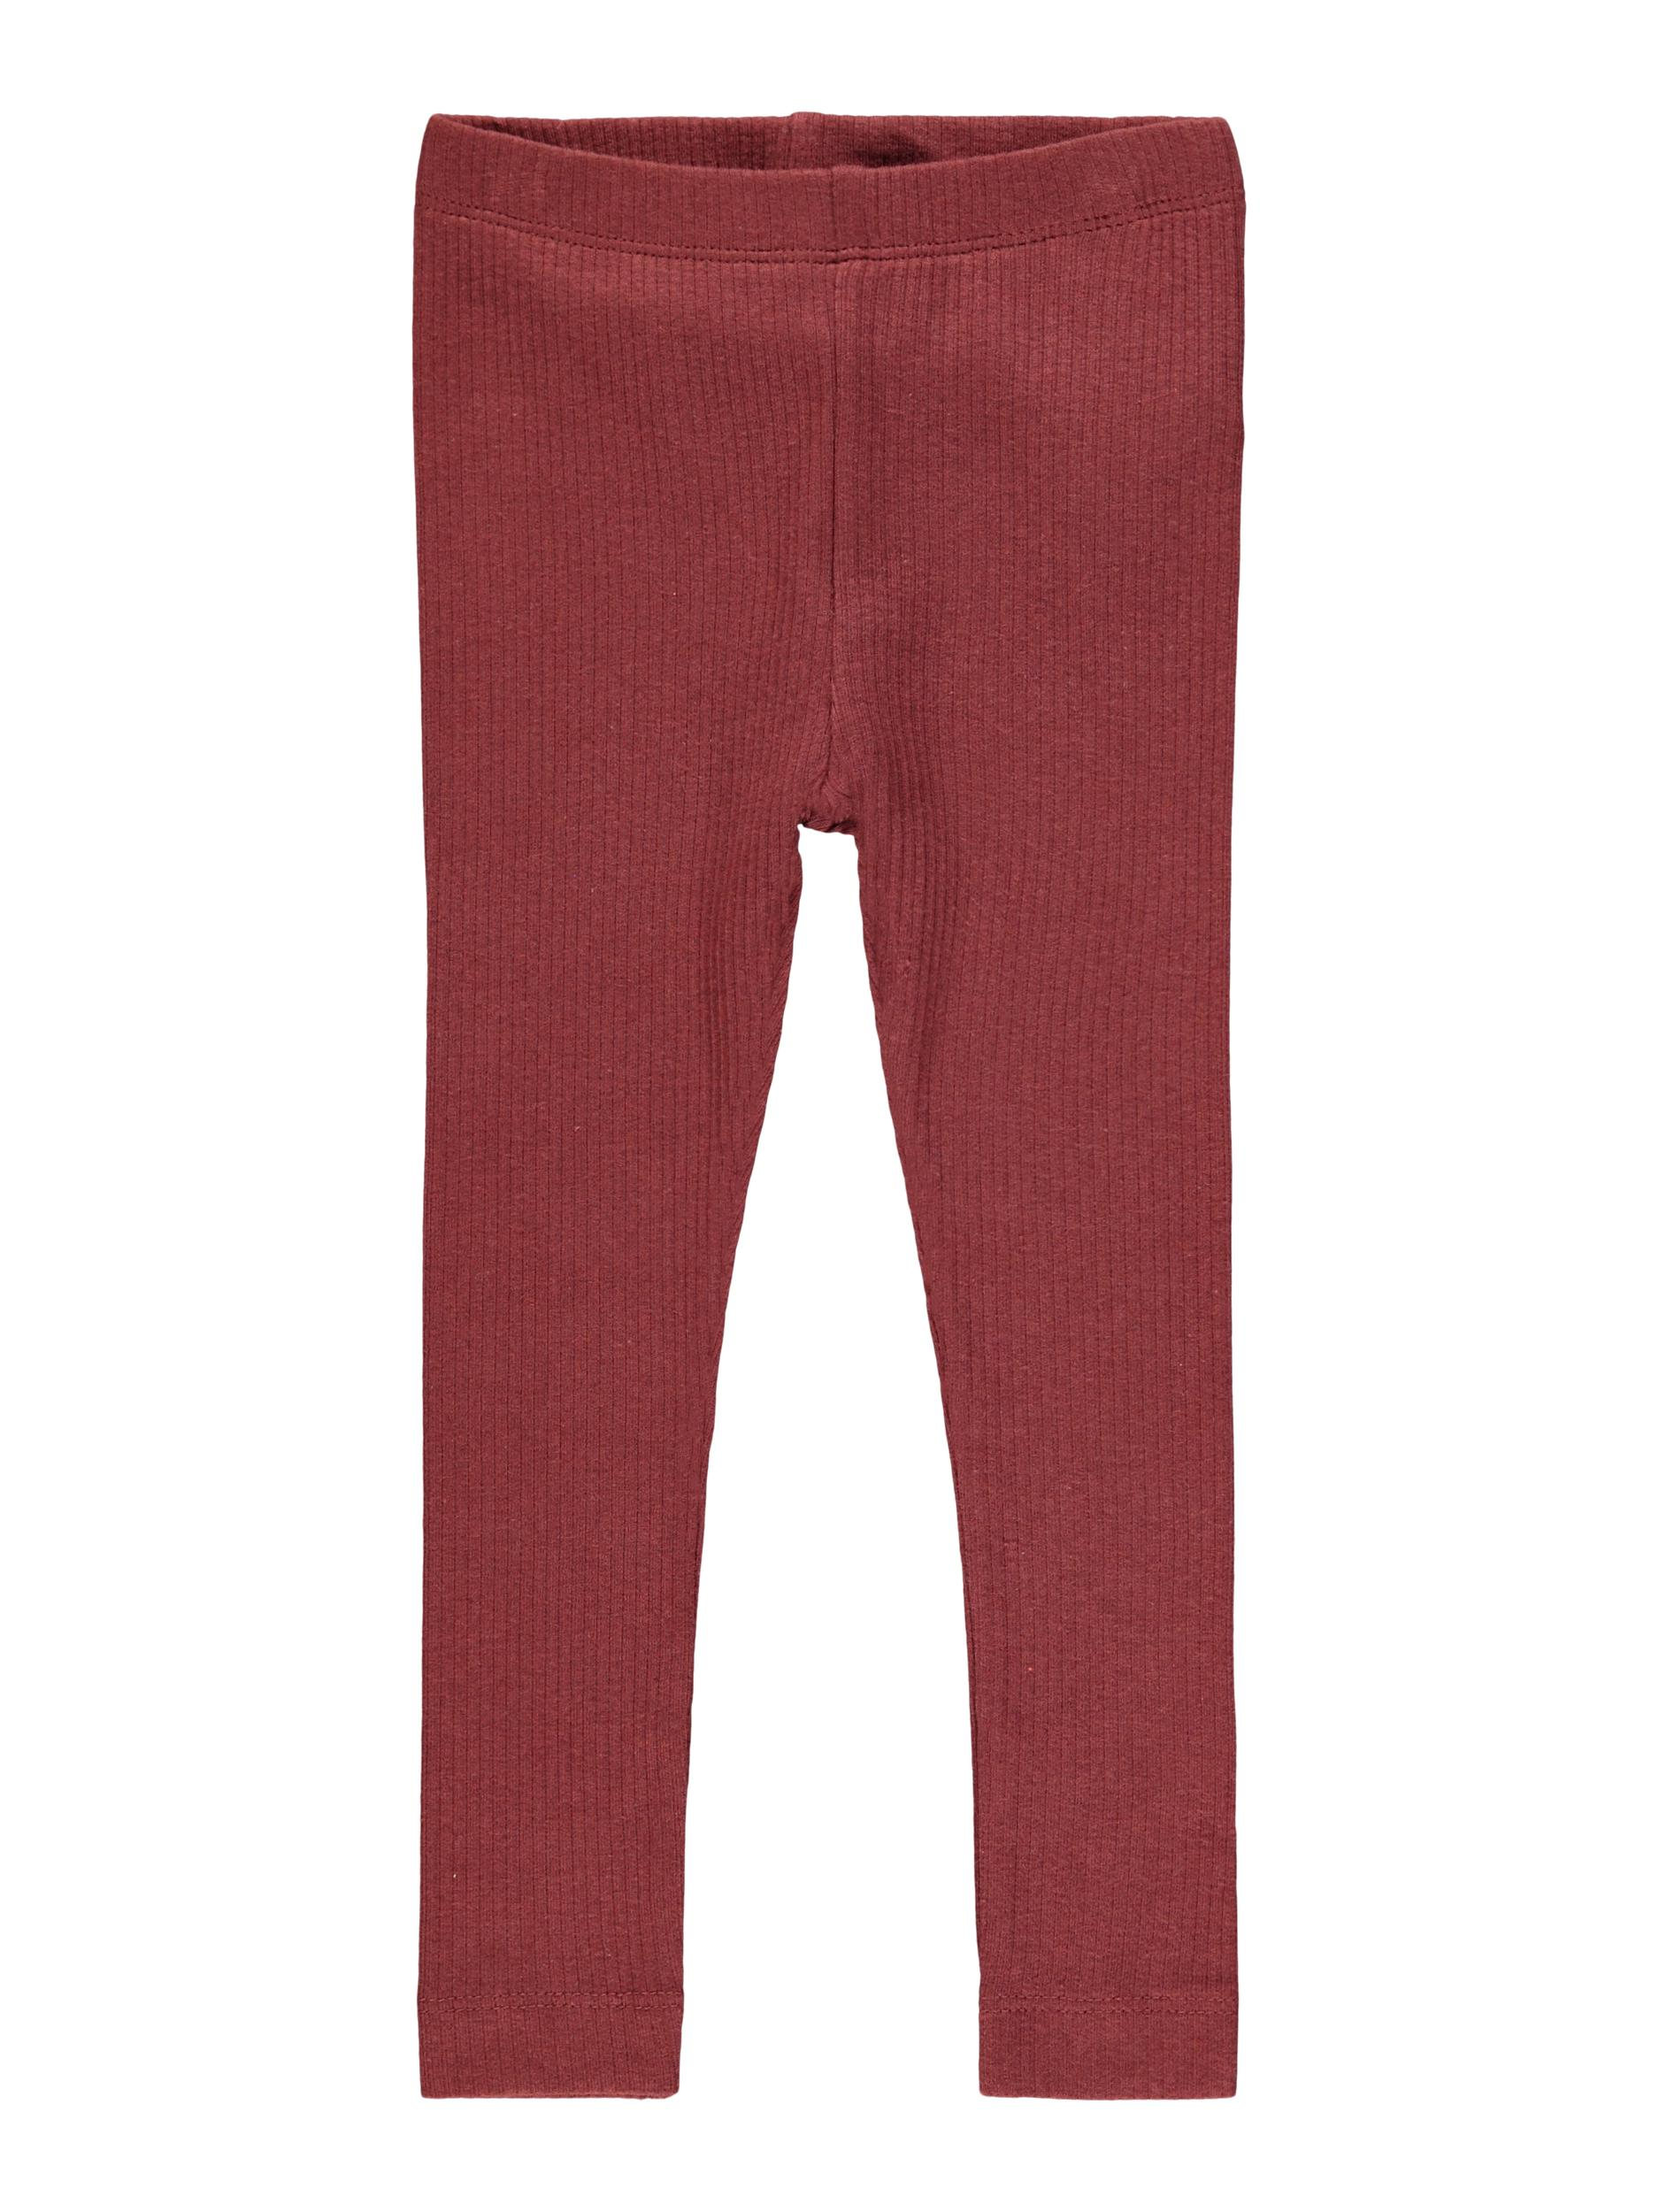 Name It Kabex leggings, spiced apple, 98